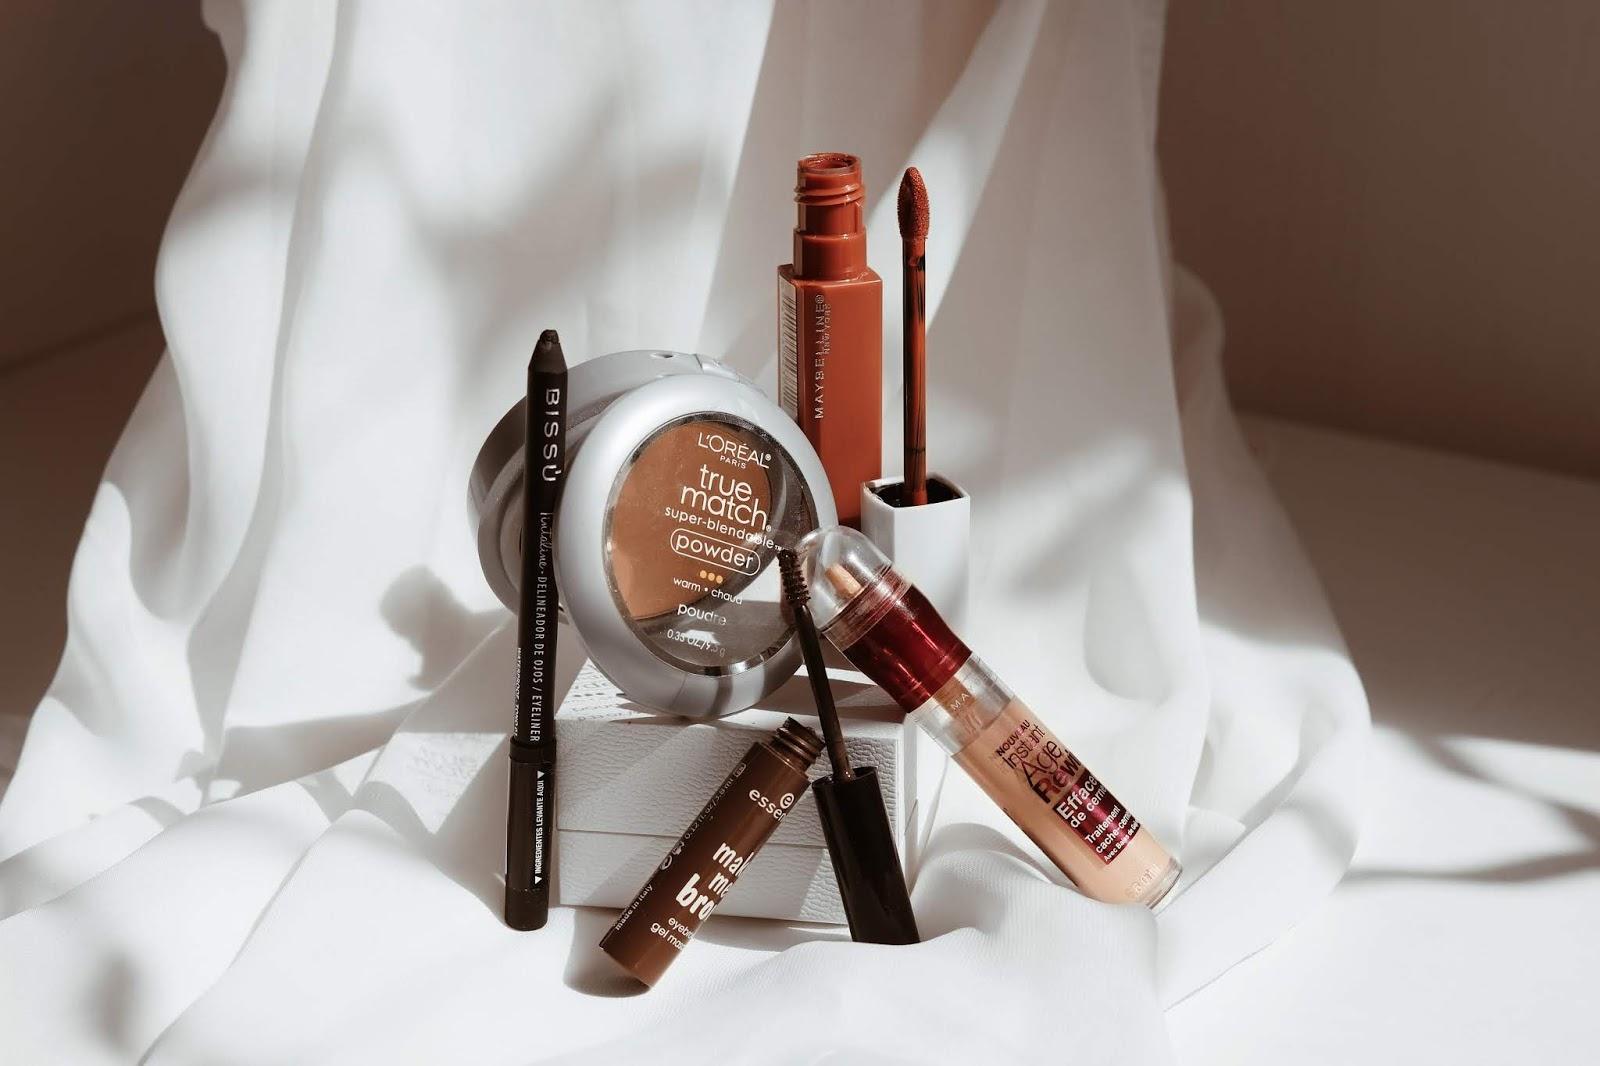 drugstore makeup that never fails